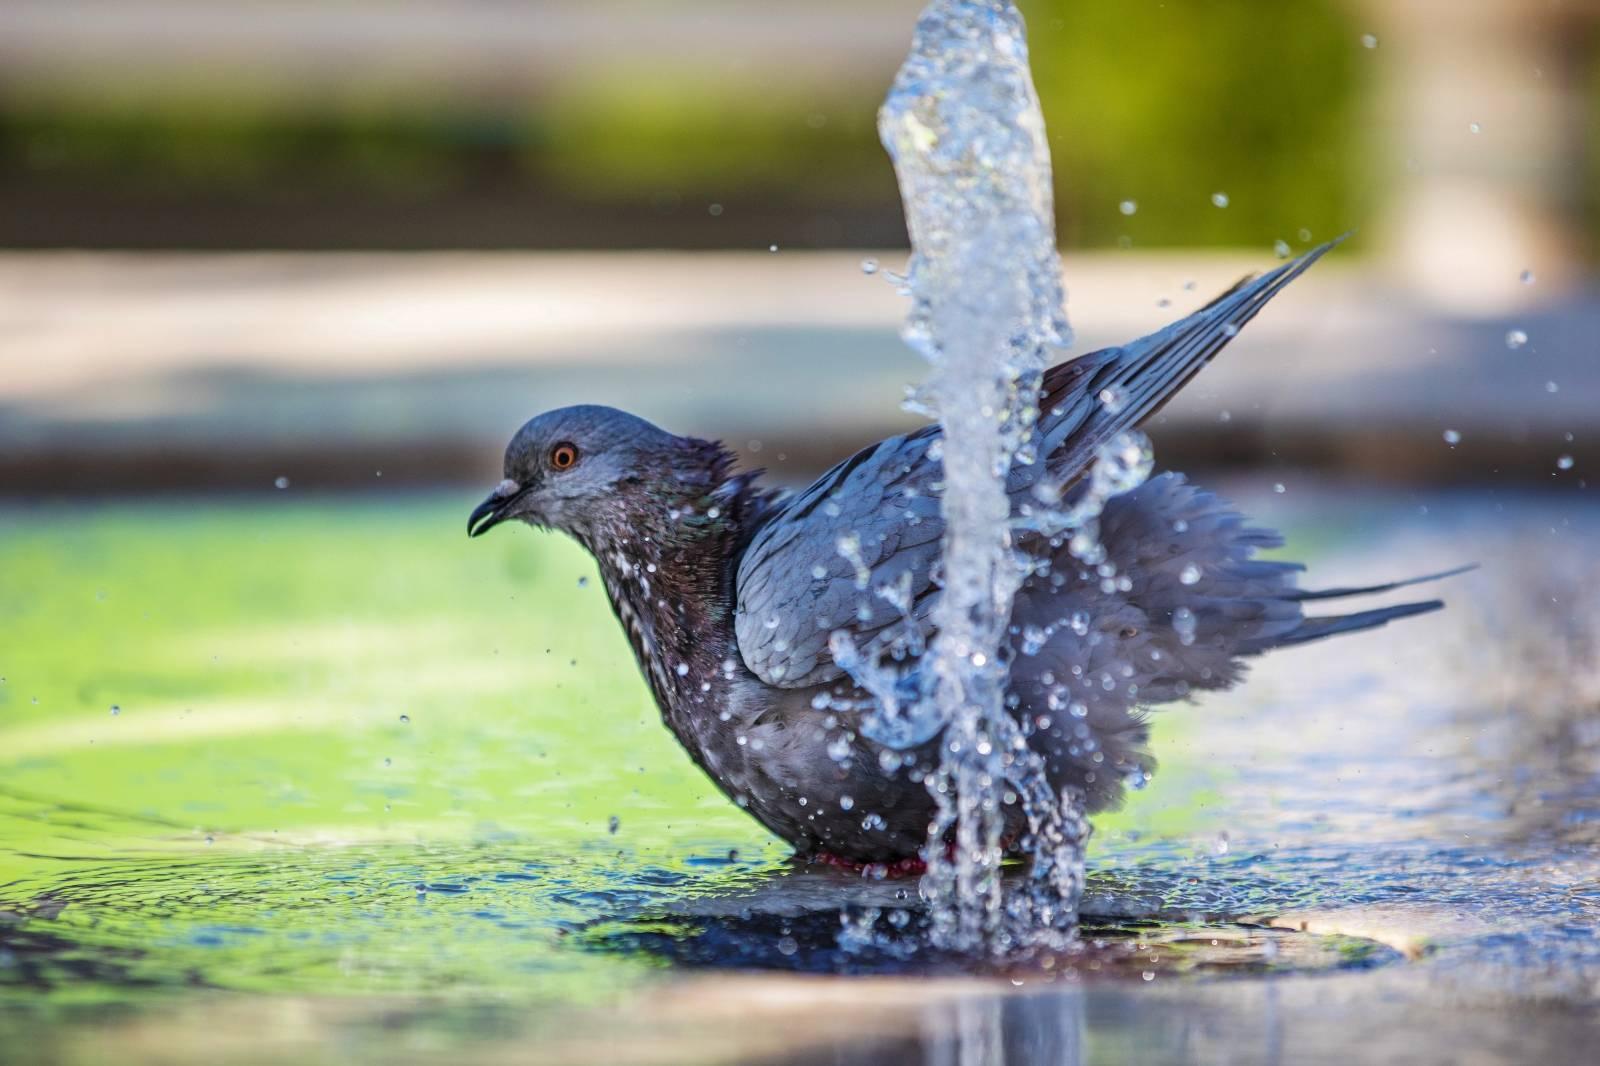 Pula: Golubovi se otuširali na fontani